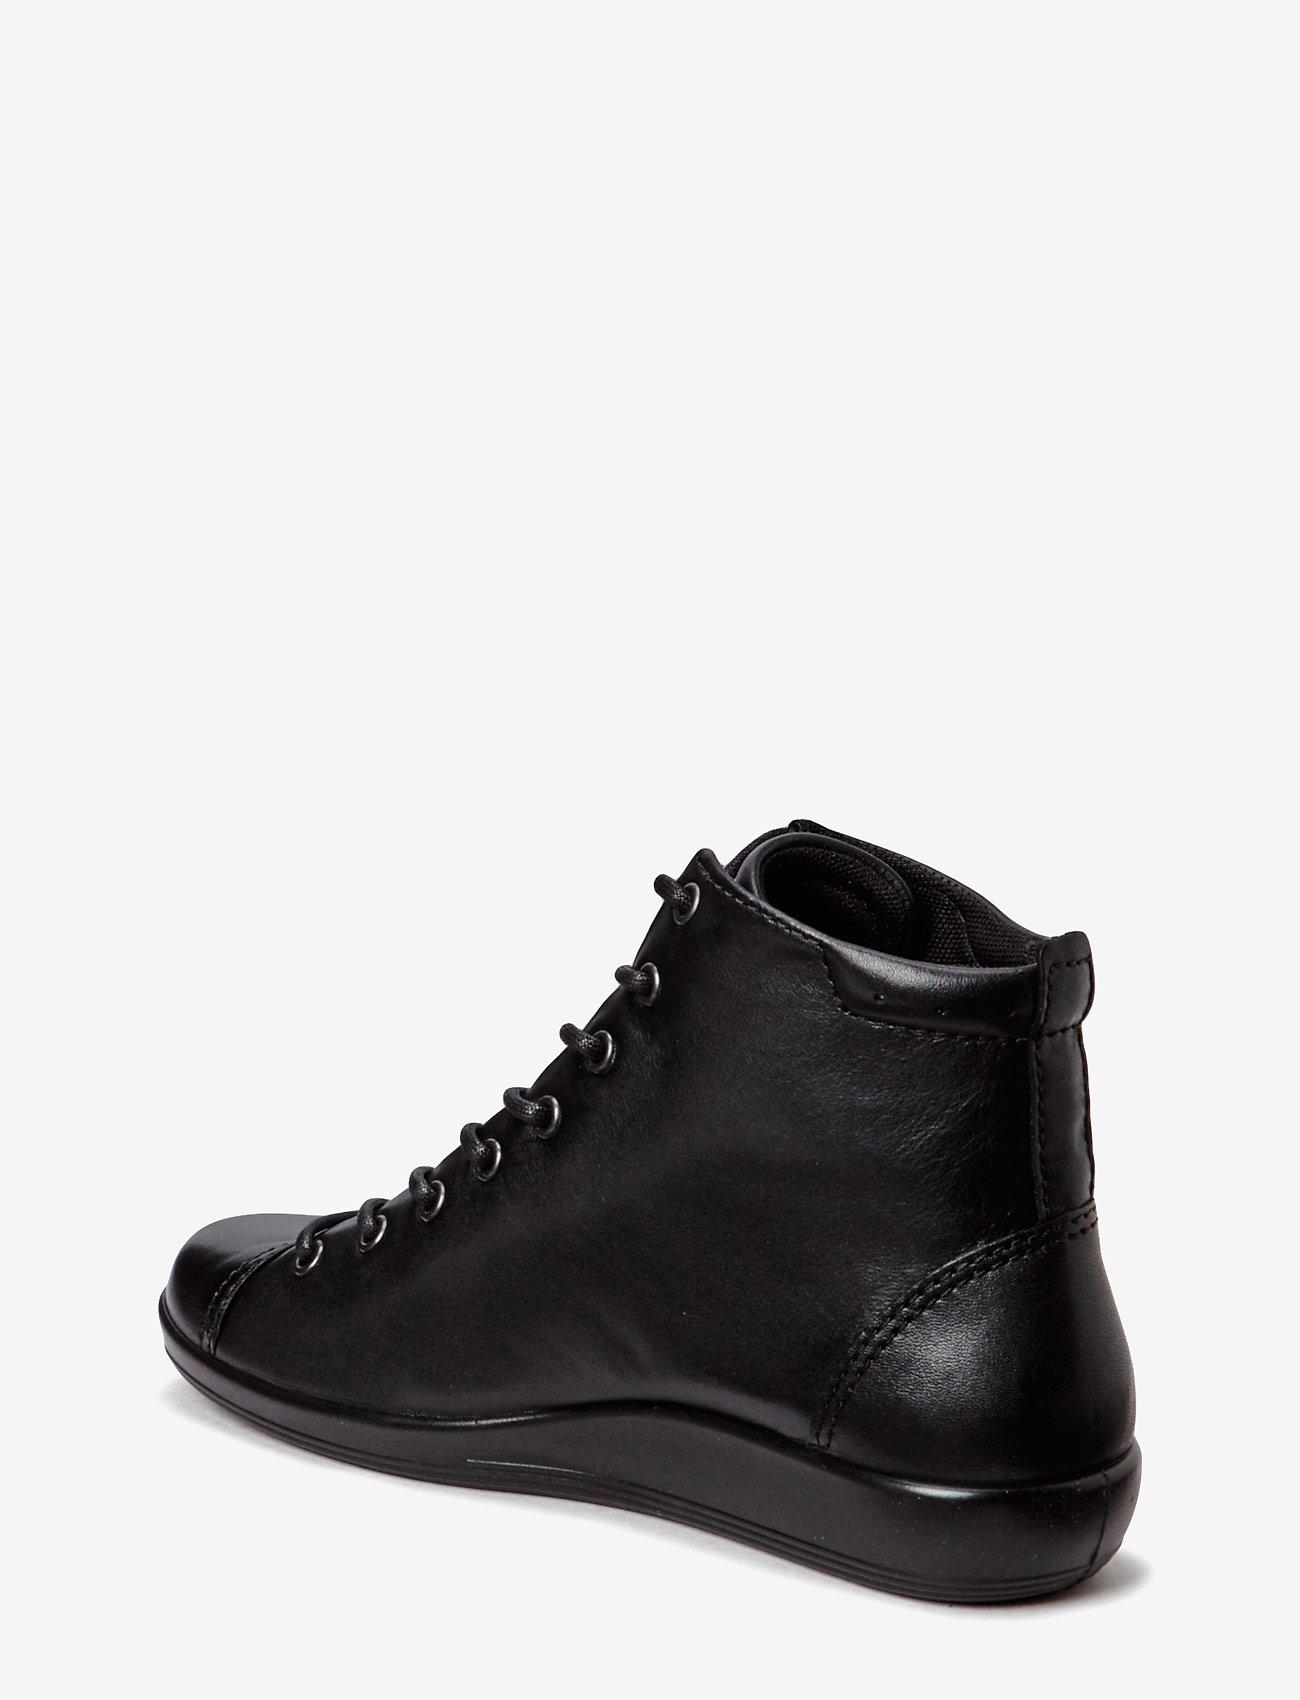 ECCO - SOFT 2.0 - sportiska stila apavi ar paaugstinātu potītes daļu - black with black sole - 1